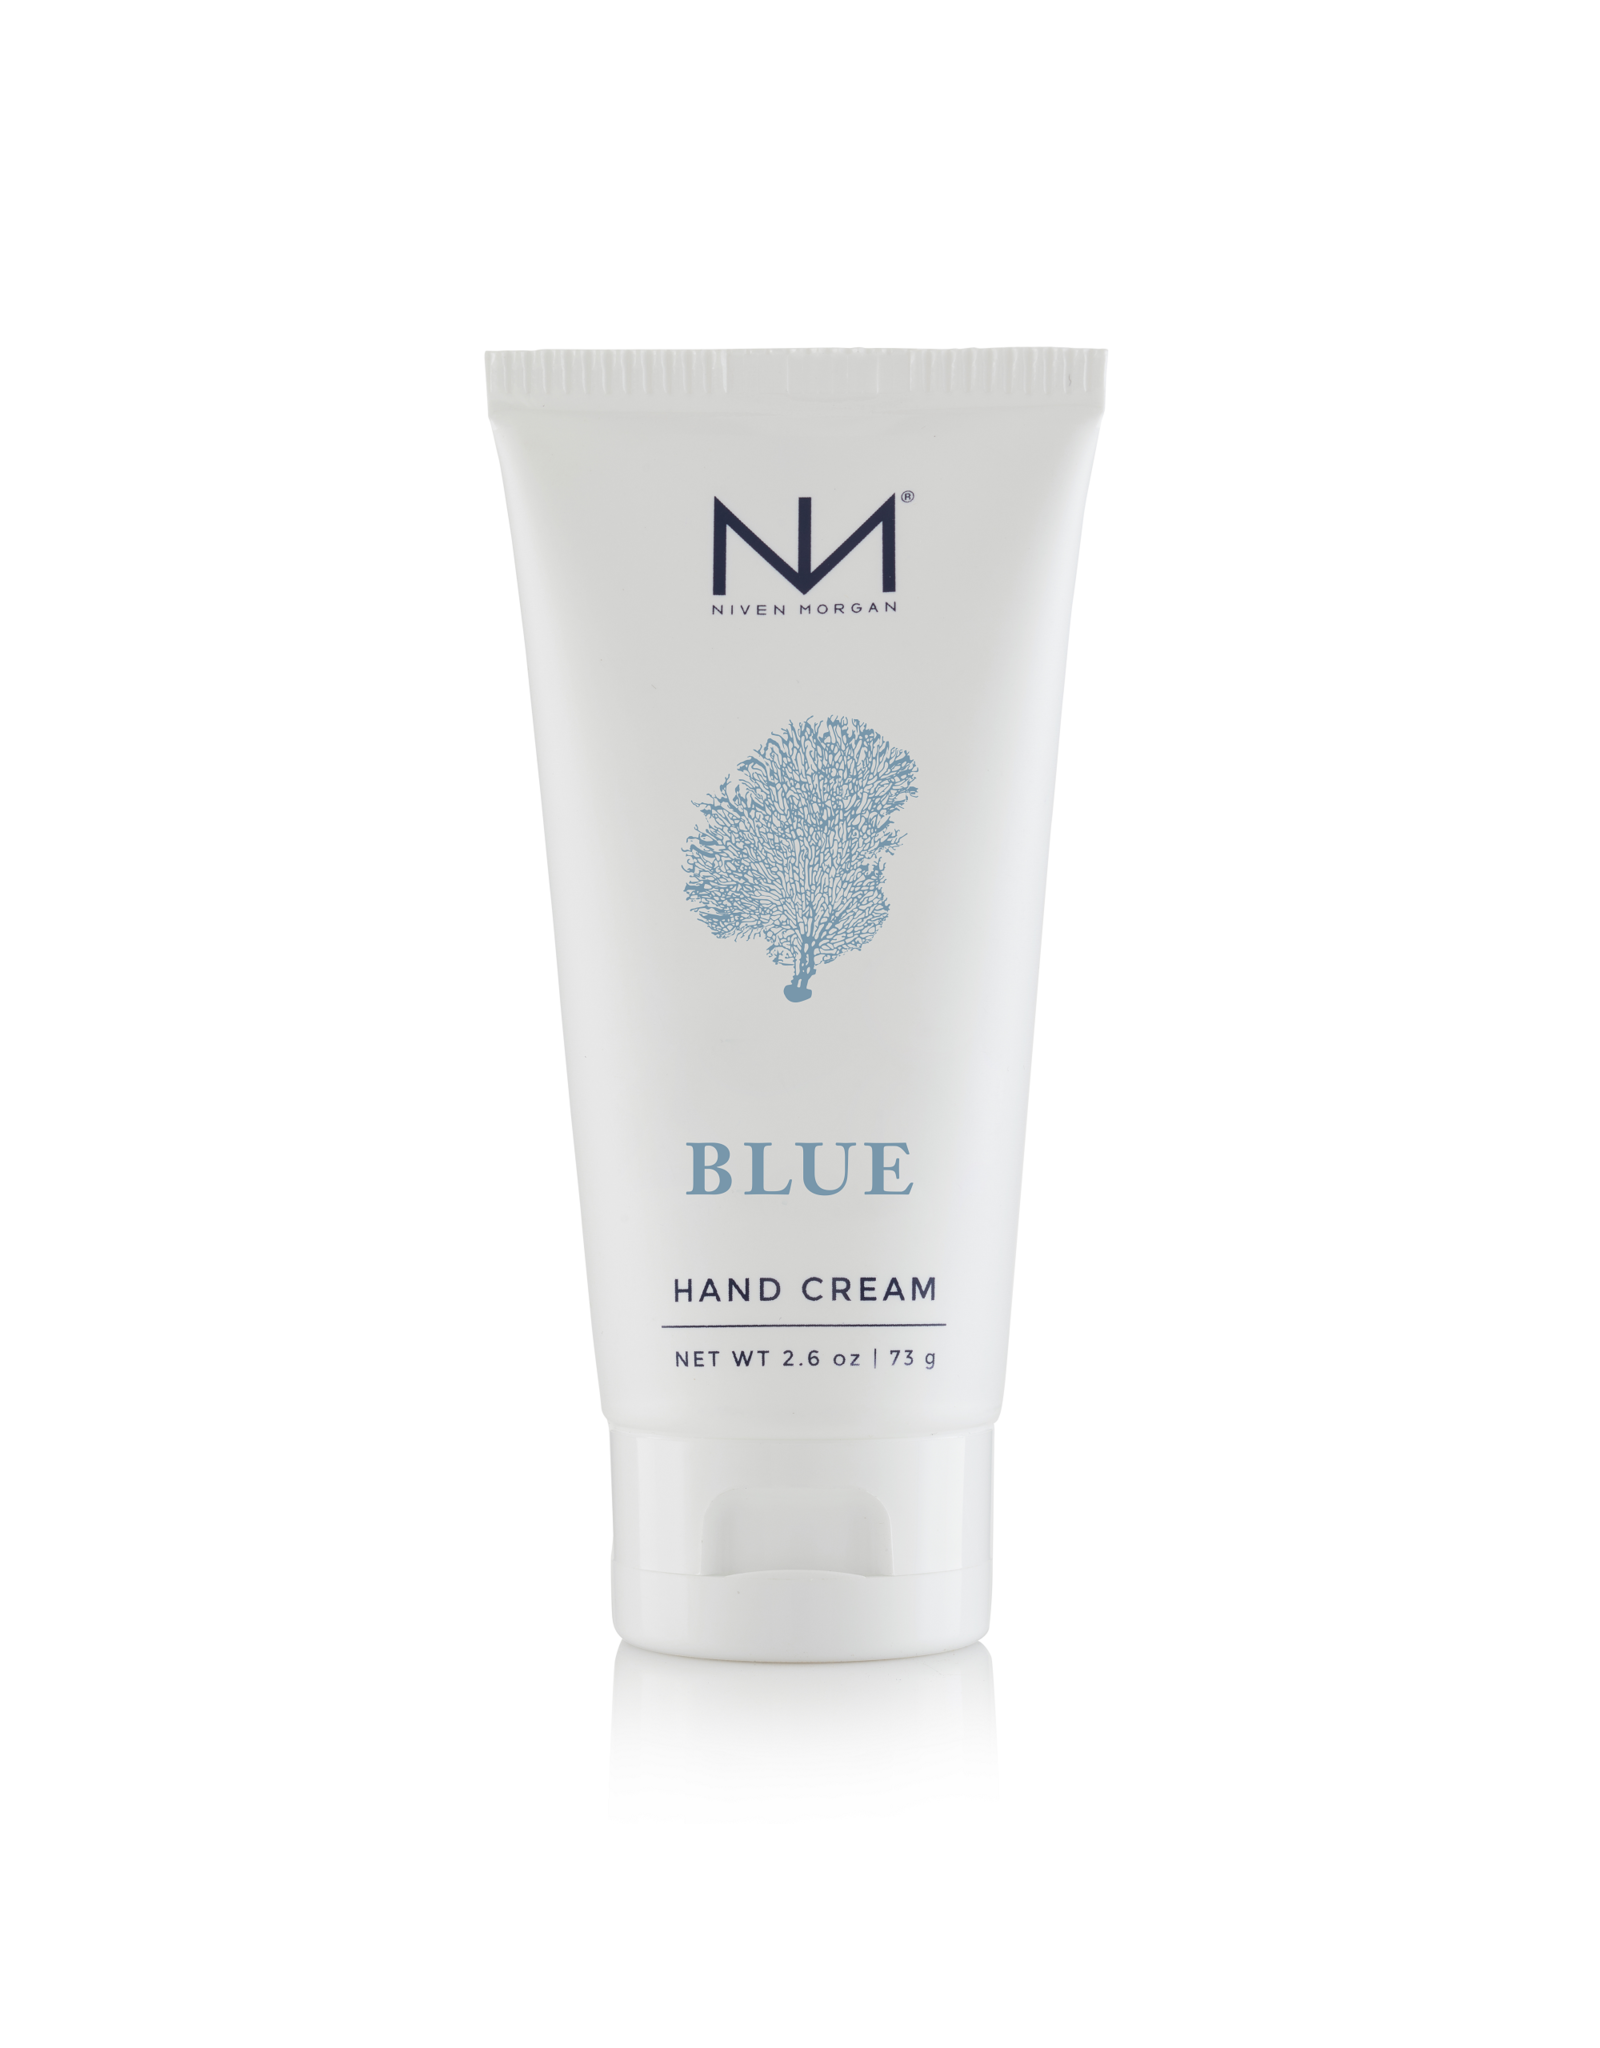 Niven Morgan Niven Morgan Blue Hand Cream